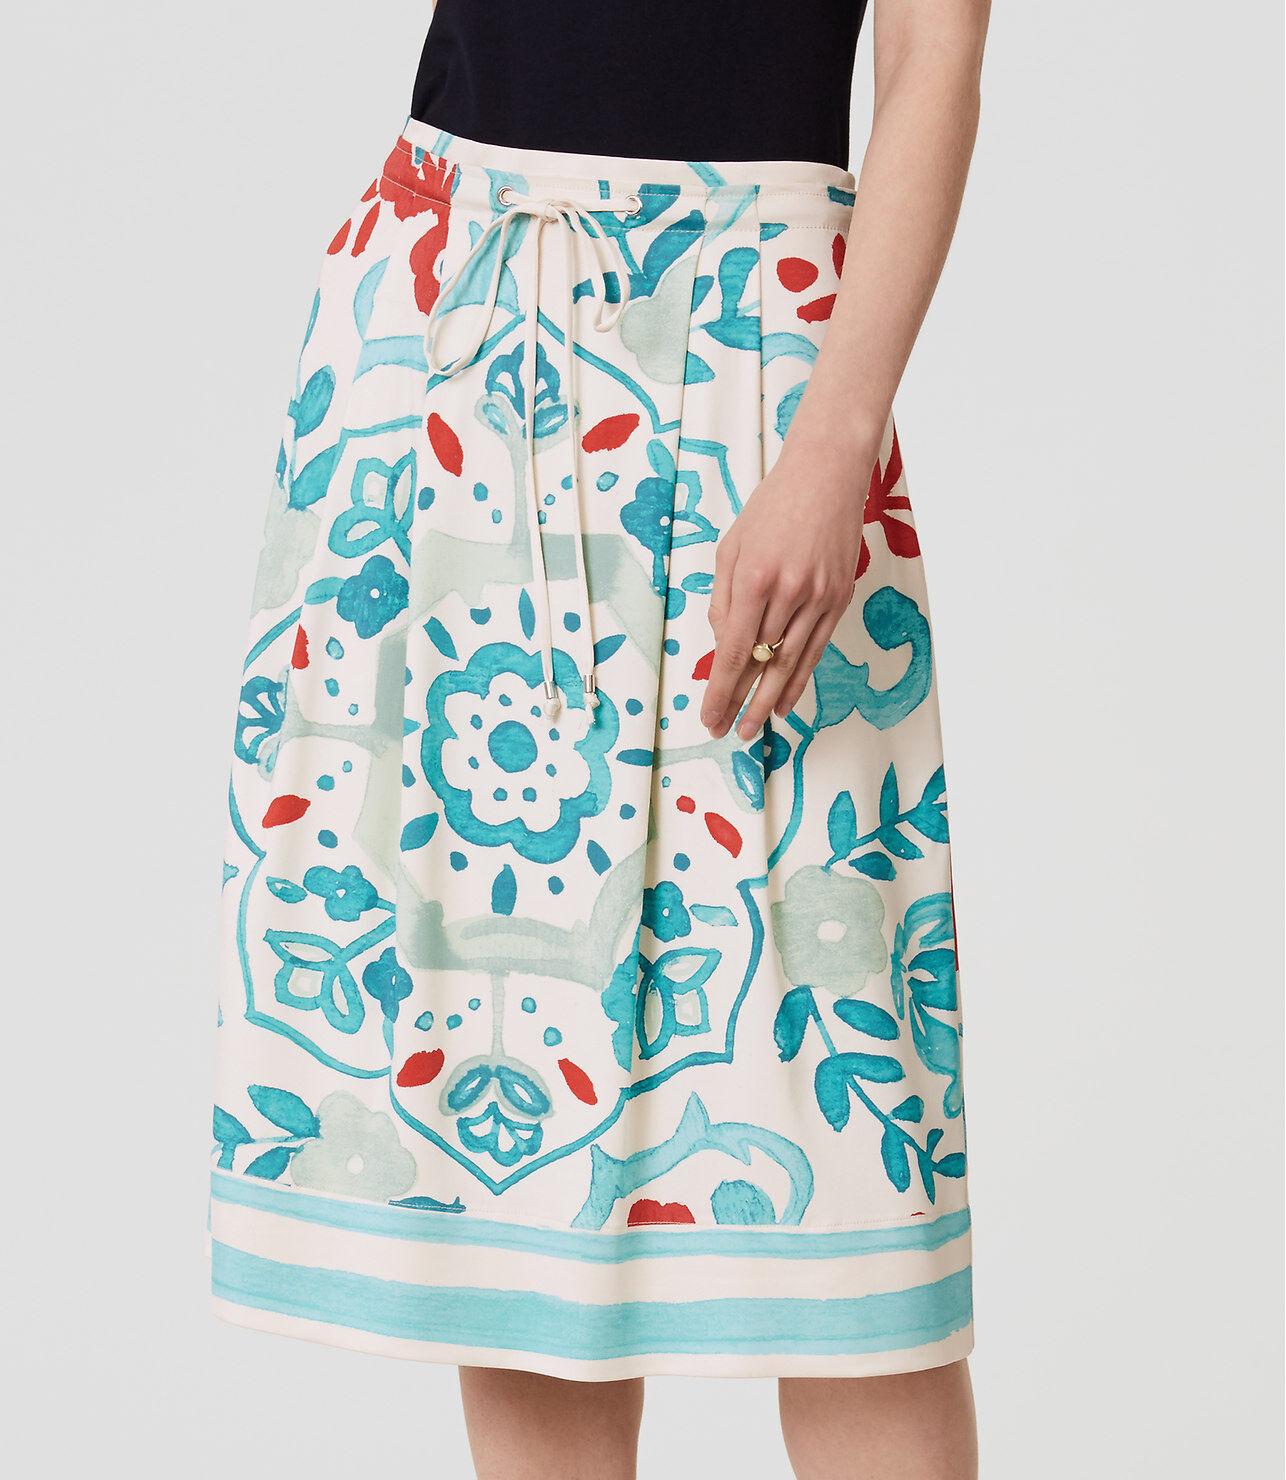 Ann Taylor LOFT Watercolor Floral Drawstring Skirt Size 6, 14, 10 Petite NWT